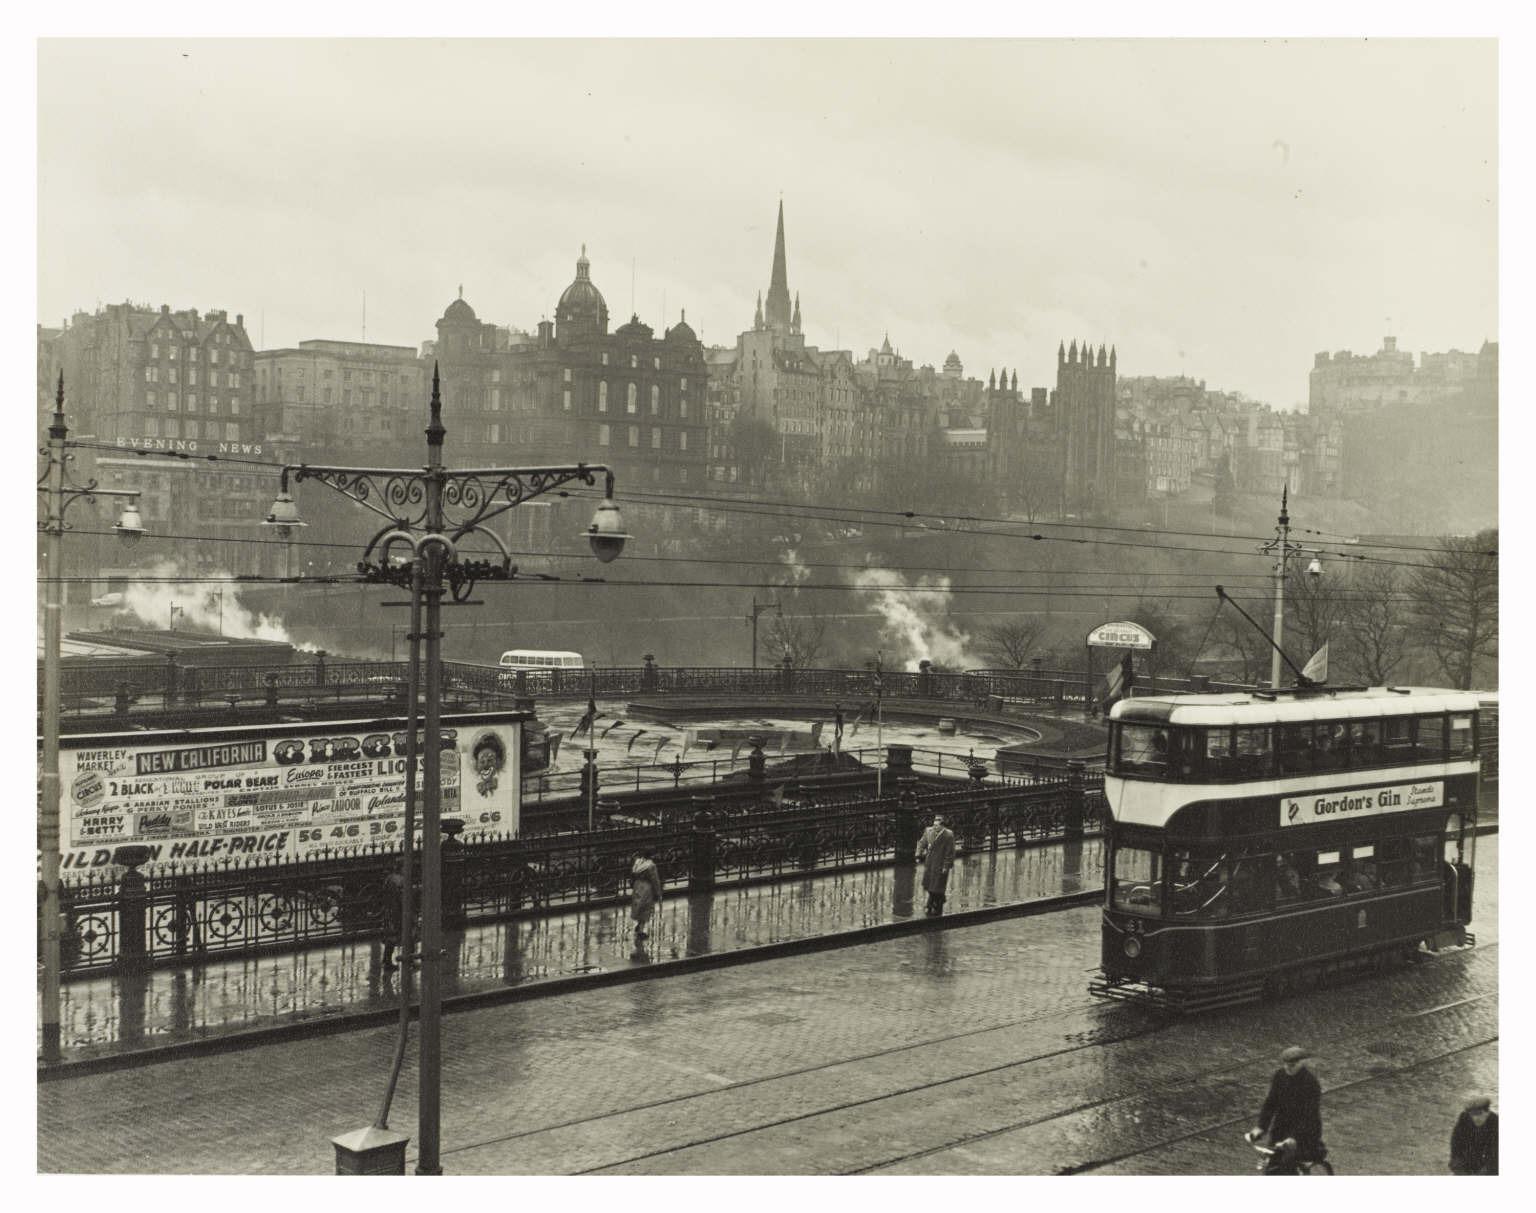 Trams on Princes Street